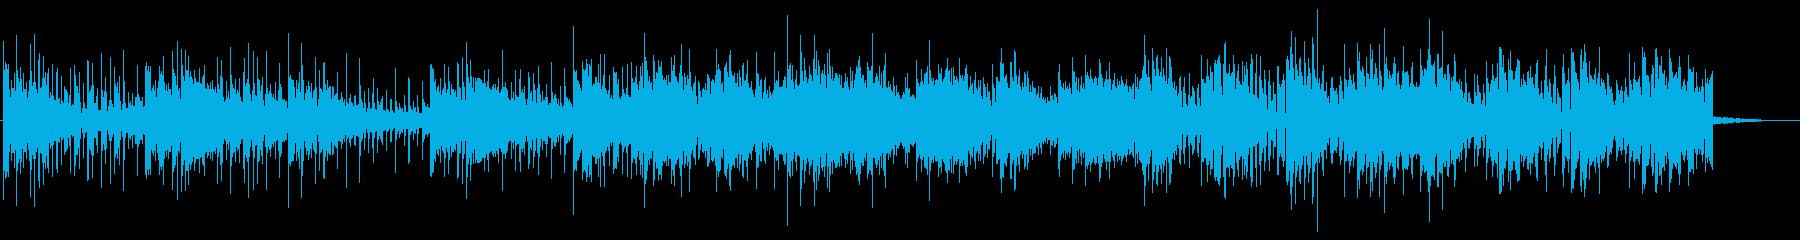 【Epic】サスペンス調、緊張の場面2の再生済みの波形